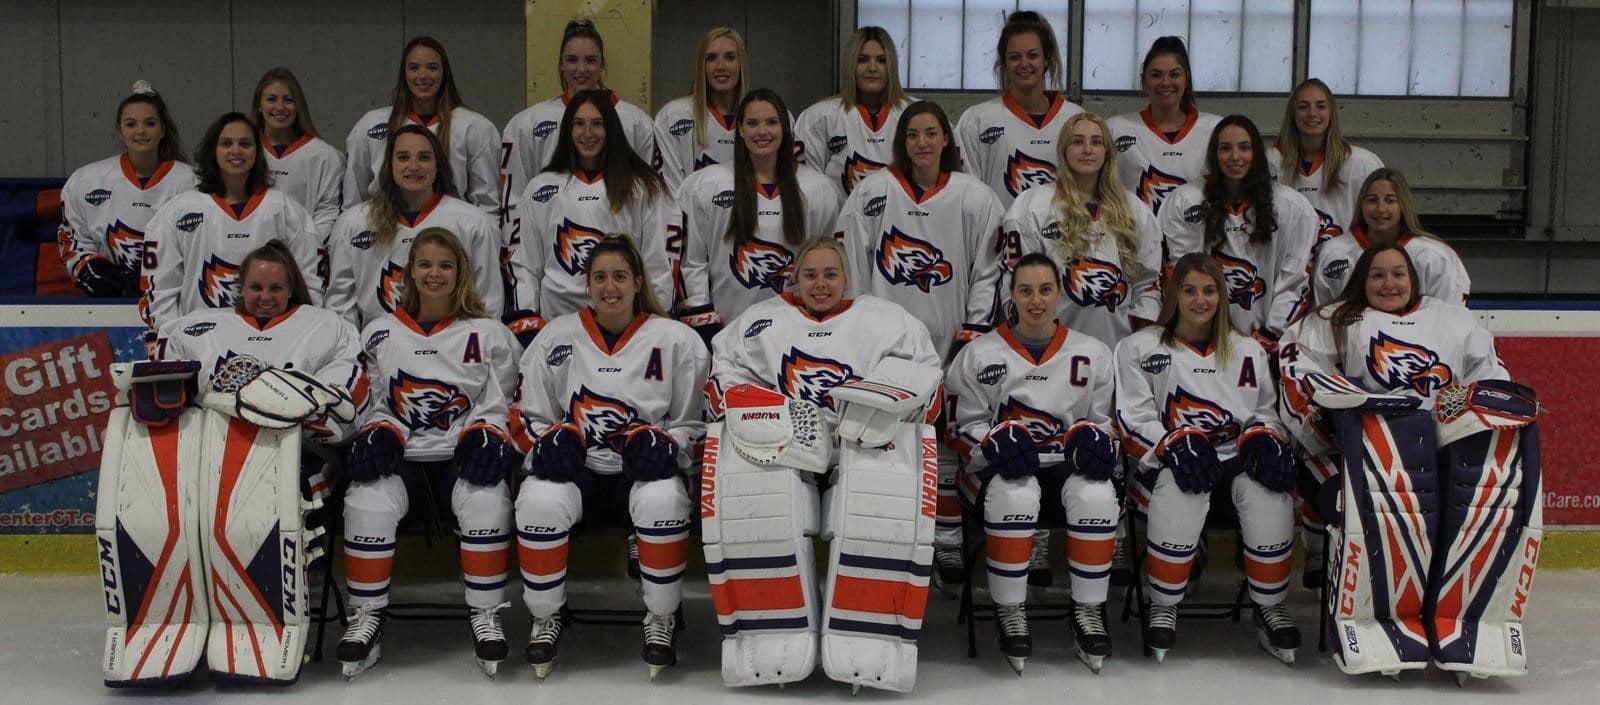 group photo of women's hockey team